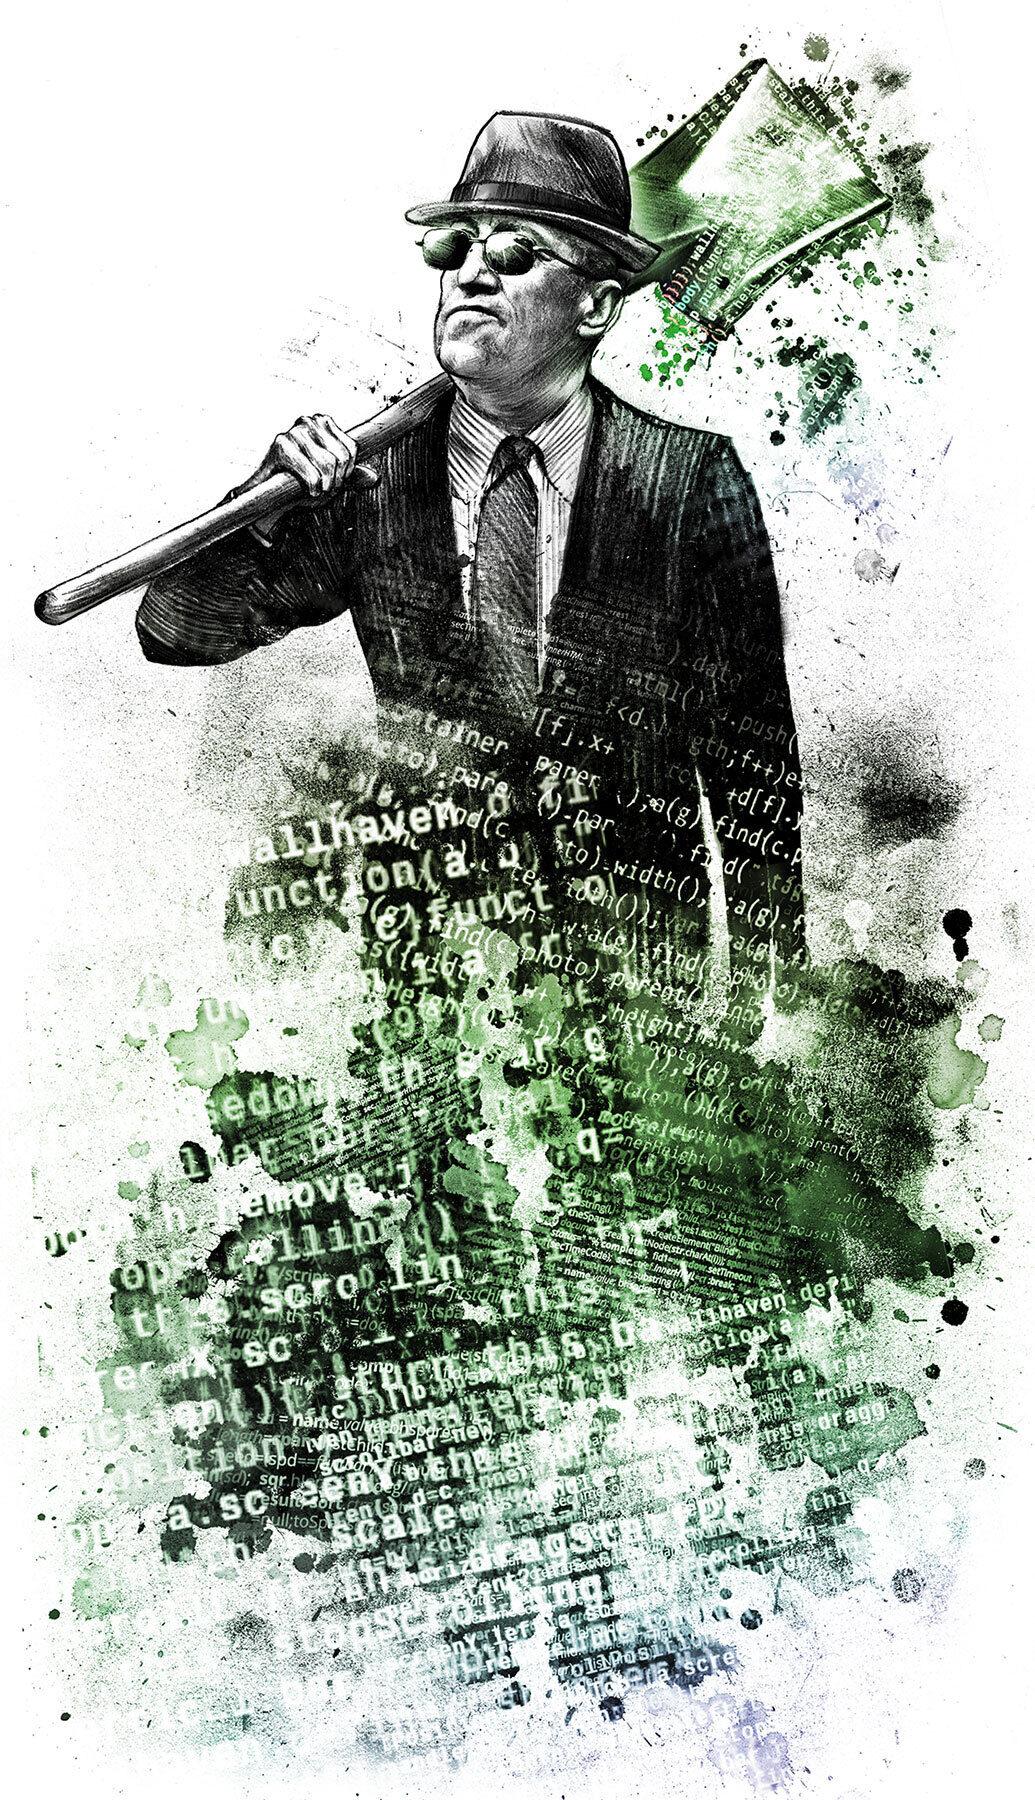 Secret service illustration editorial - Kornel Illustration | Kornel Stadler portfolio